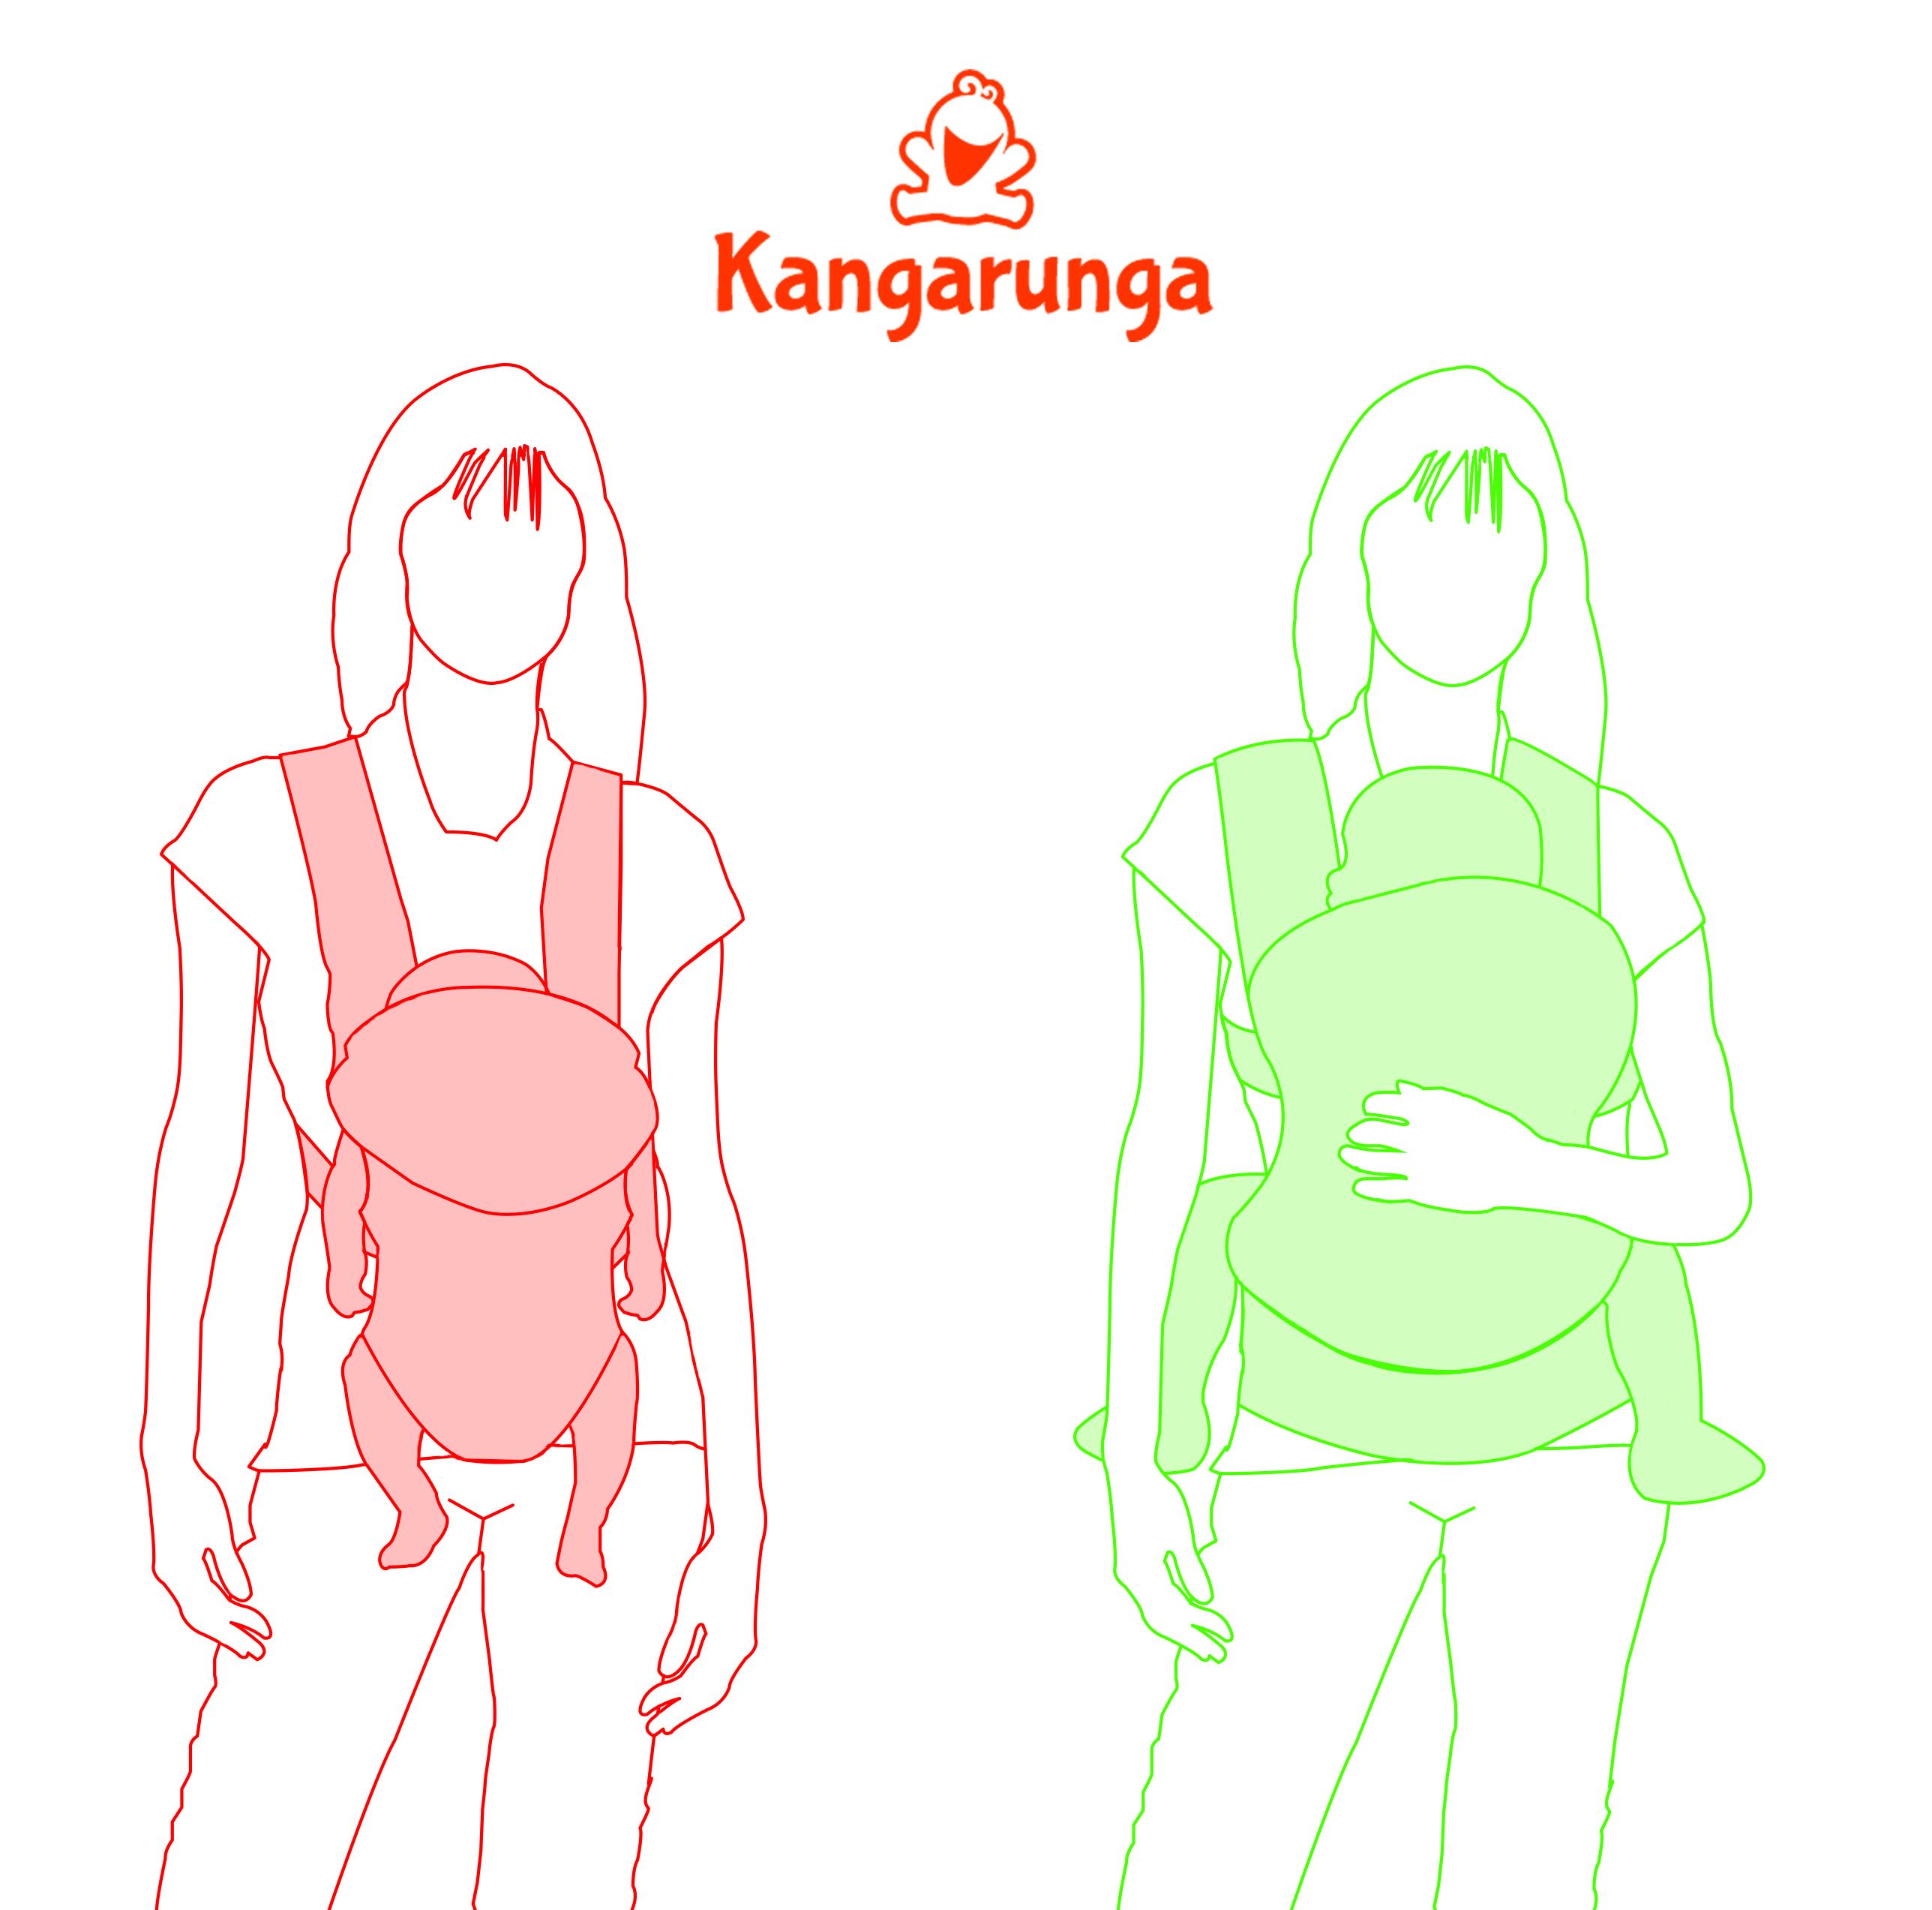 Mochila colgona vs mochila ergonómica